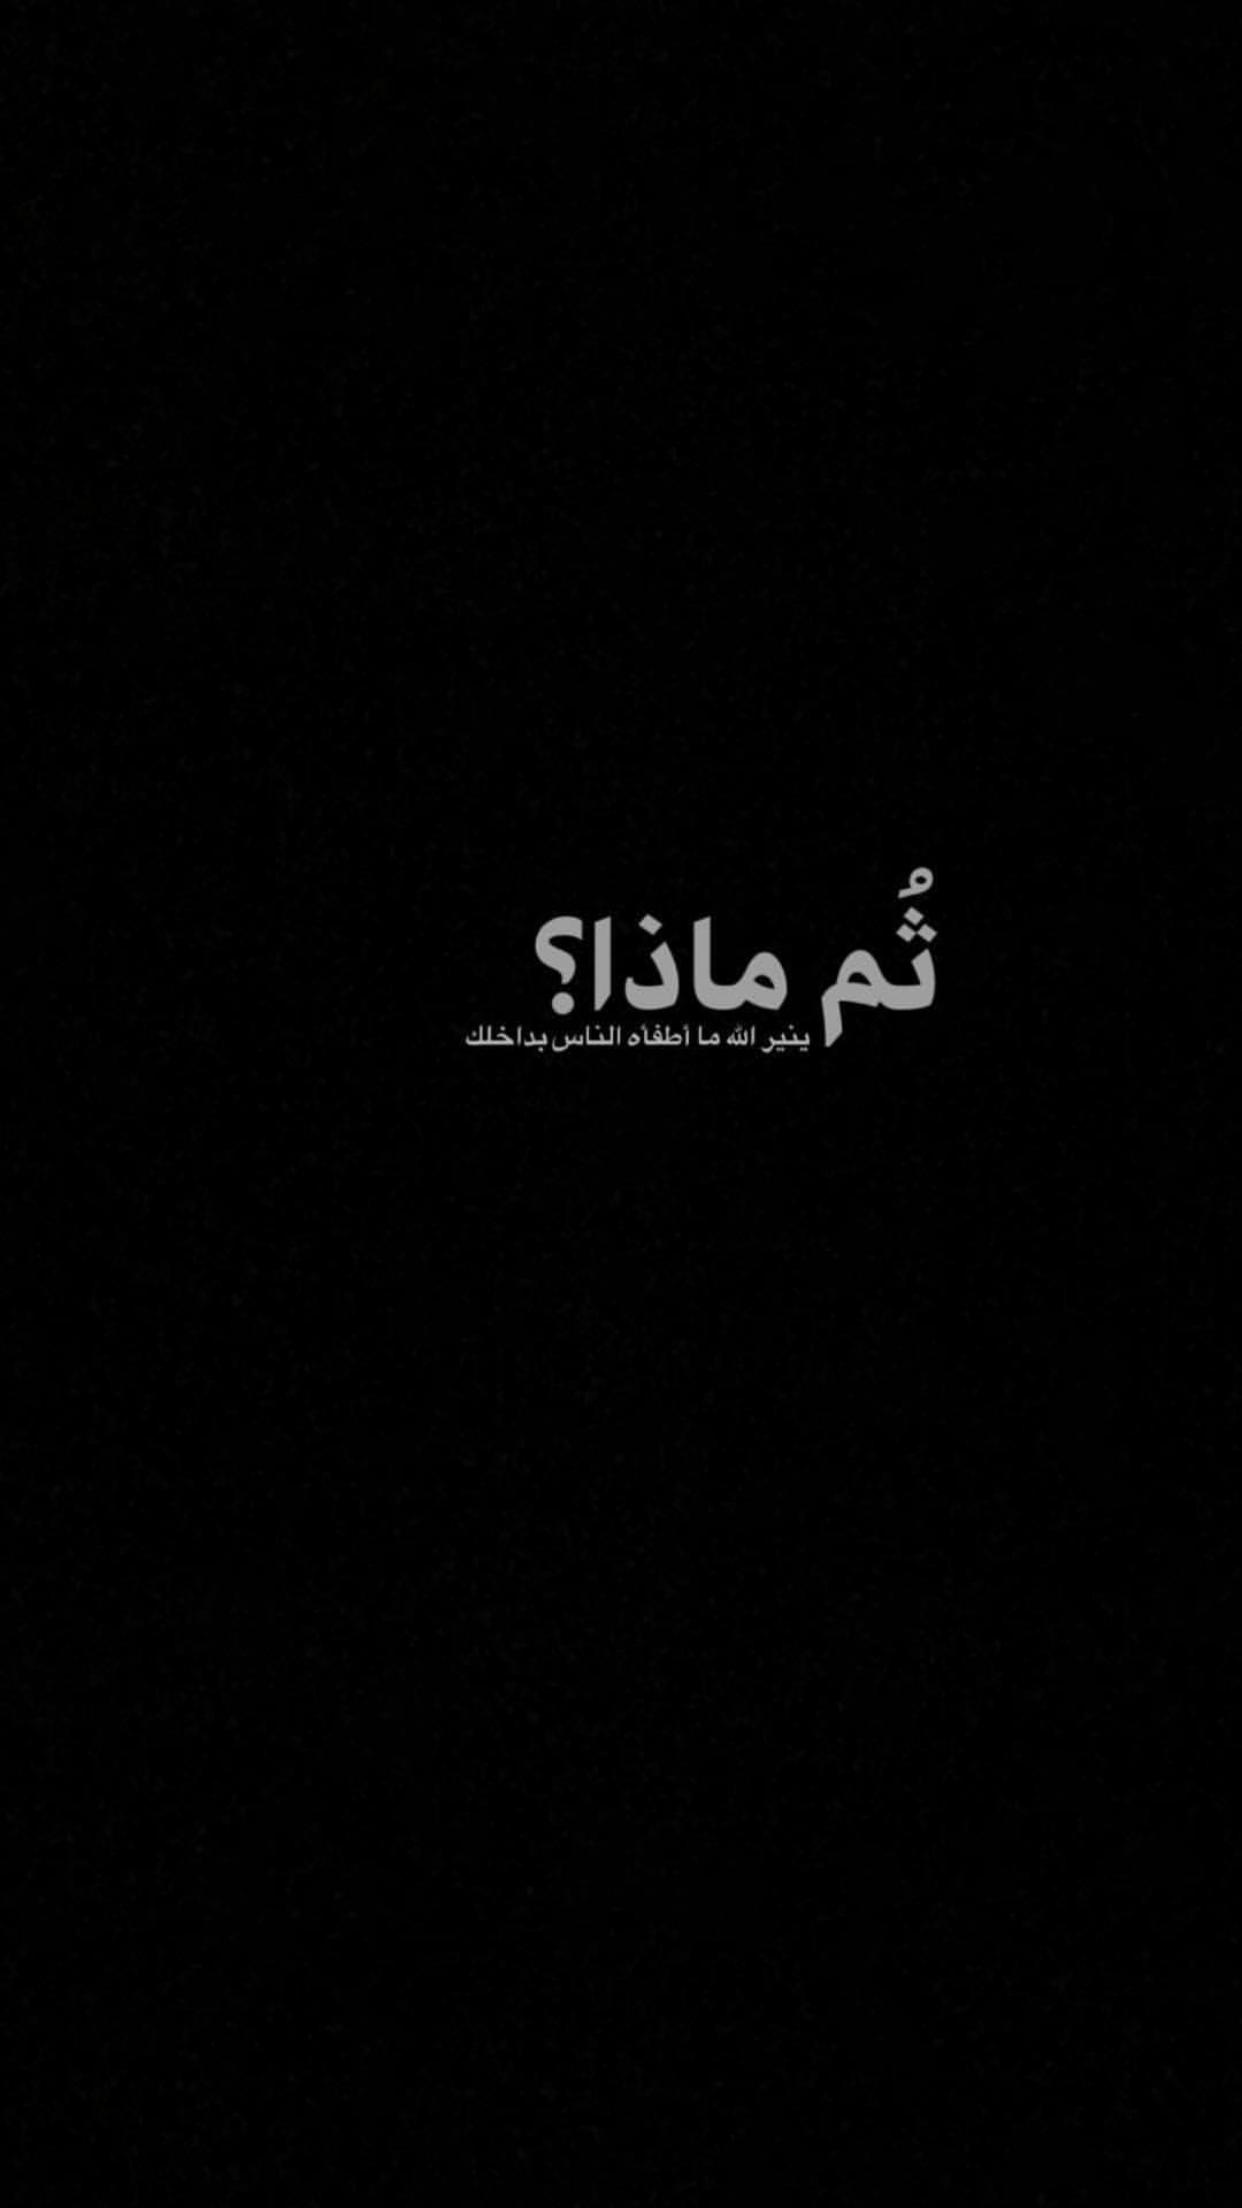 إنه عليم بذات الصدور Words Quotes Talking Quotes Islamic Inspirational Quotes